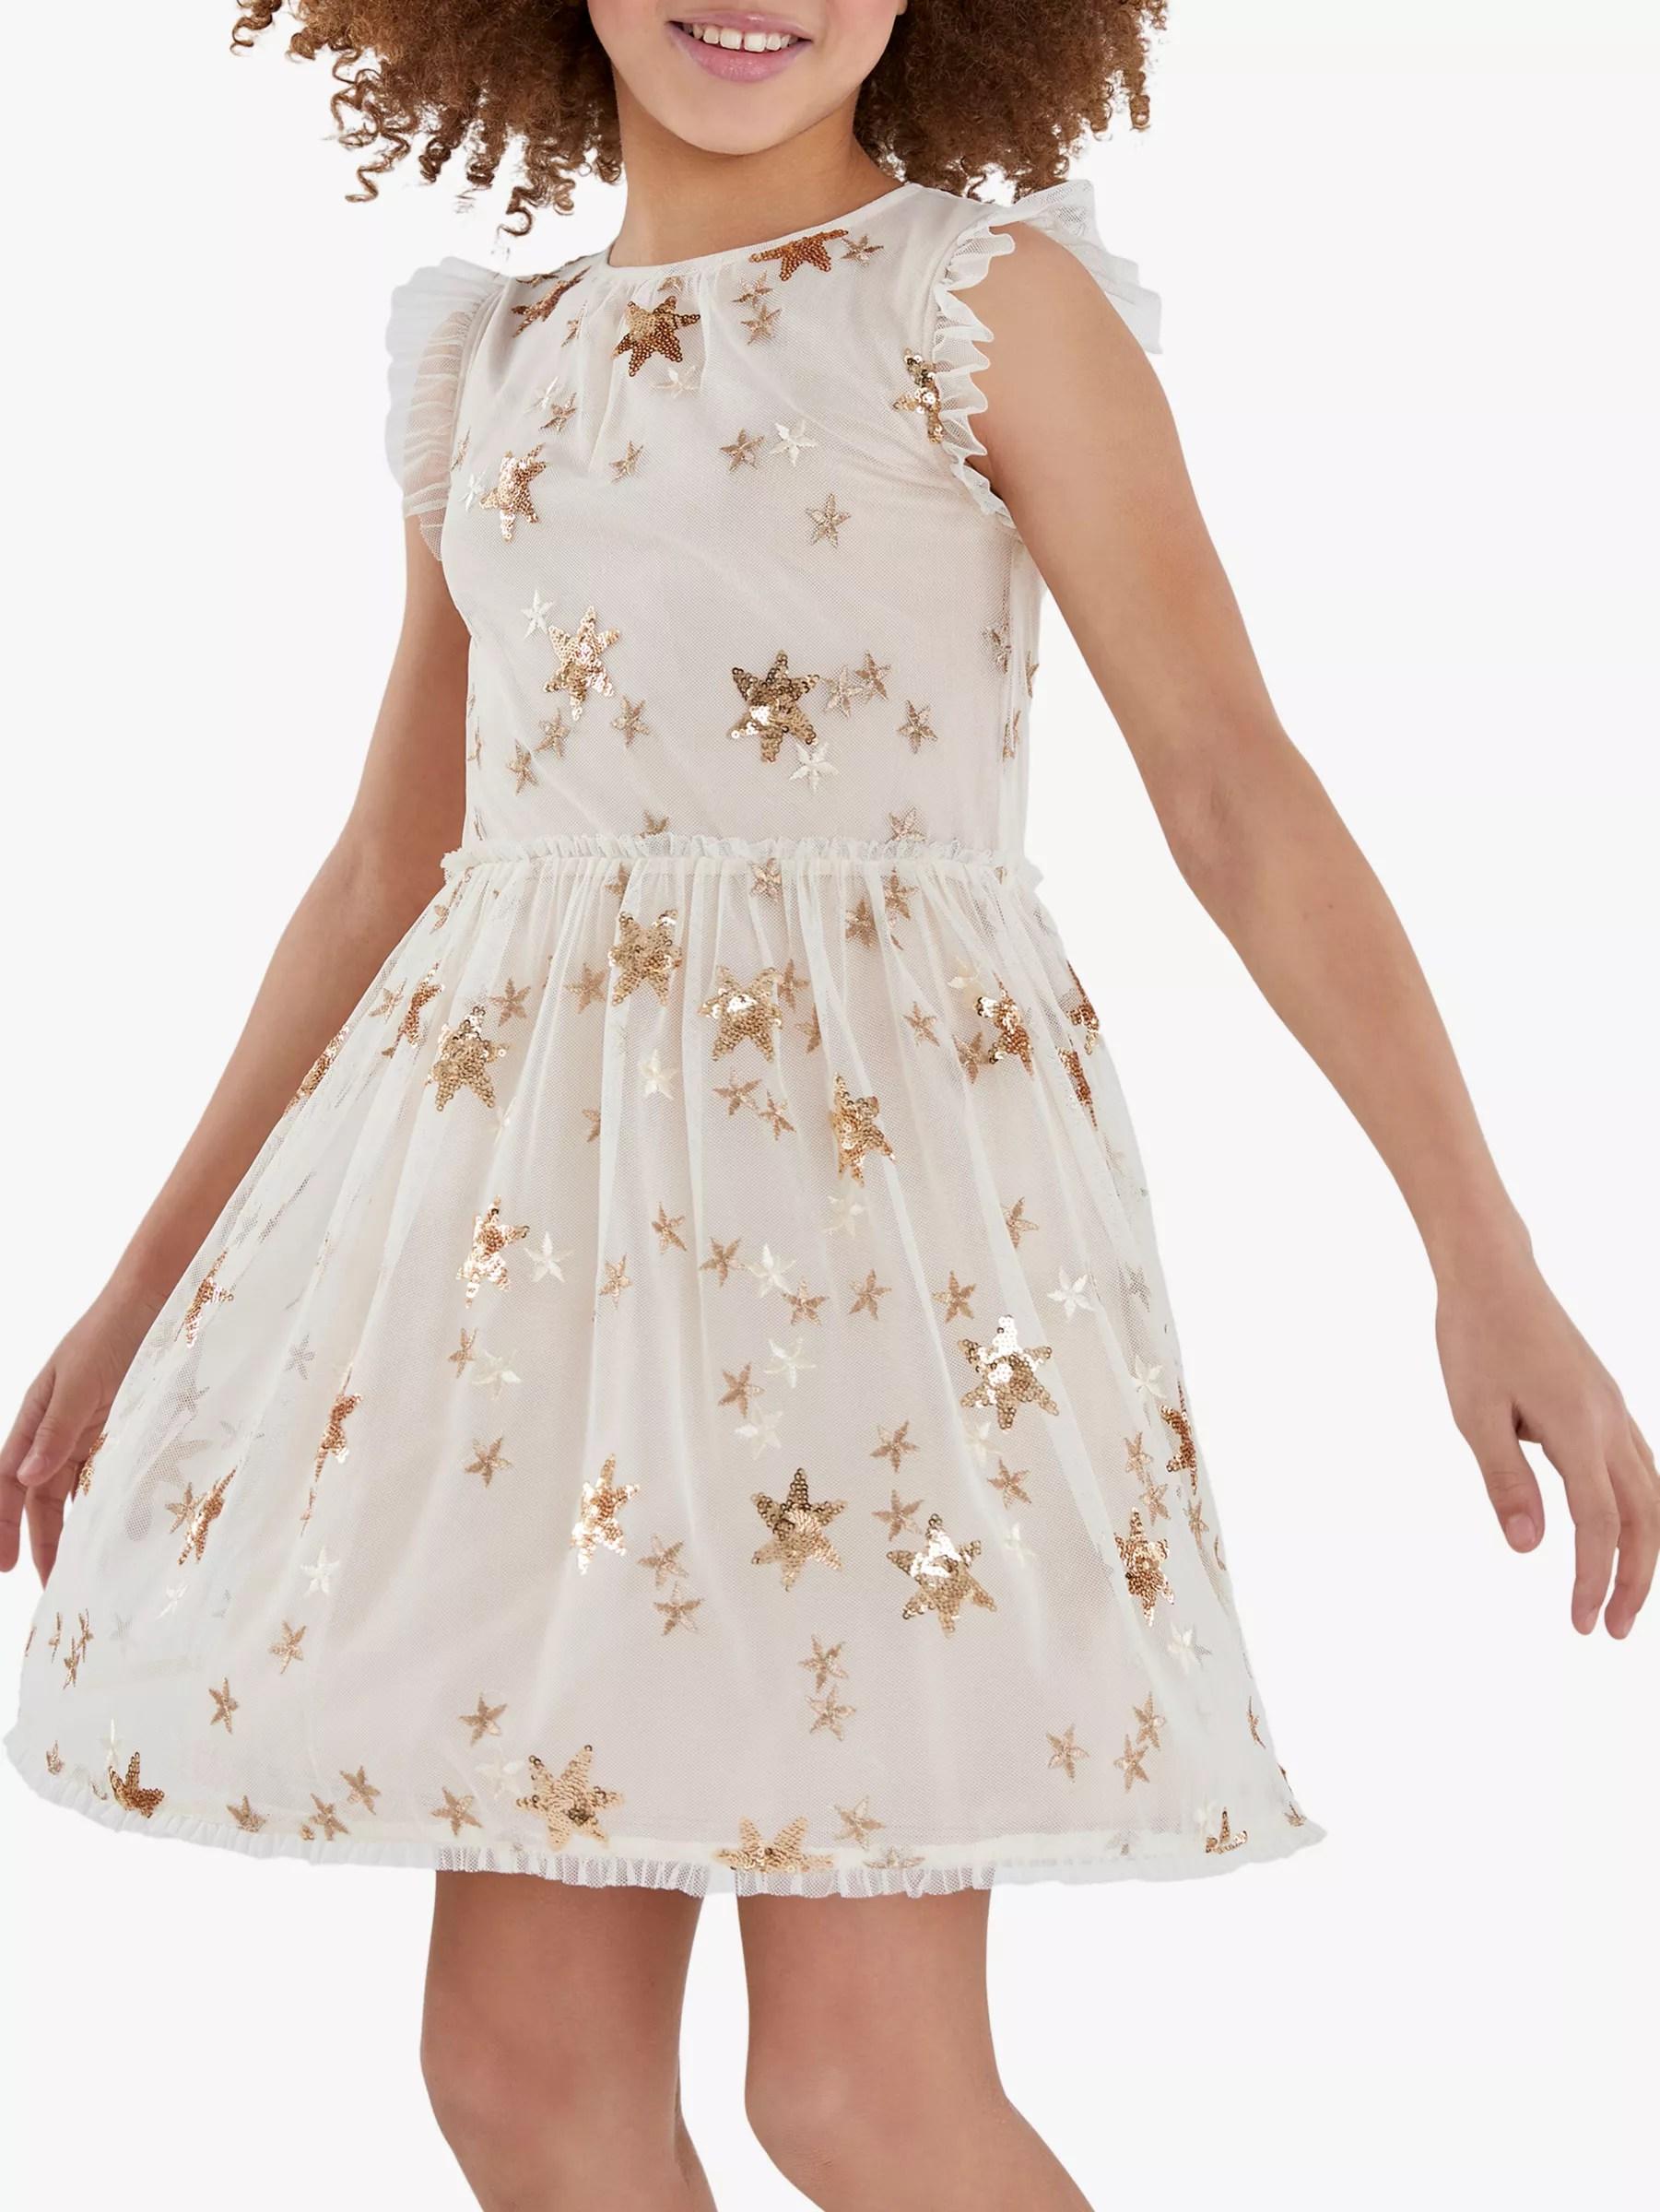 Mintie By Mint Velvet Girls Gold Star Party Dress